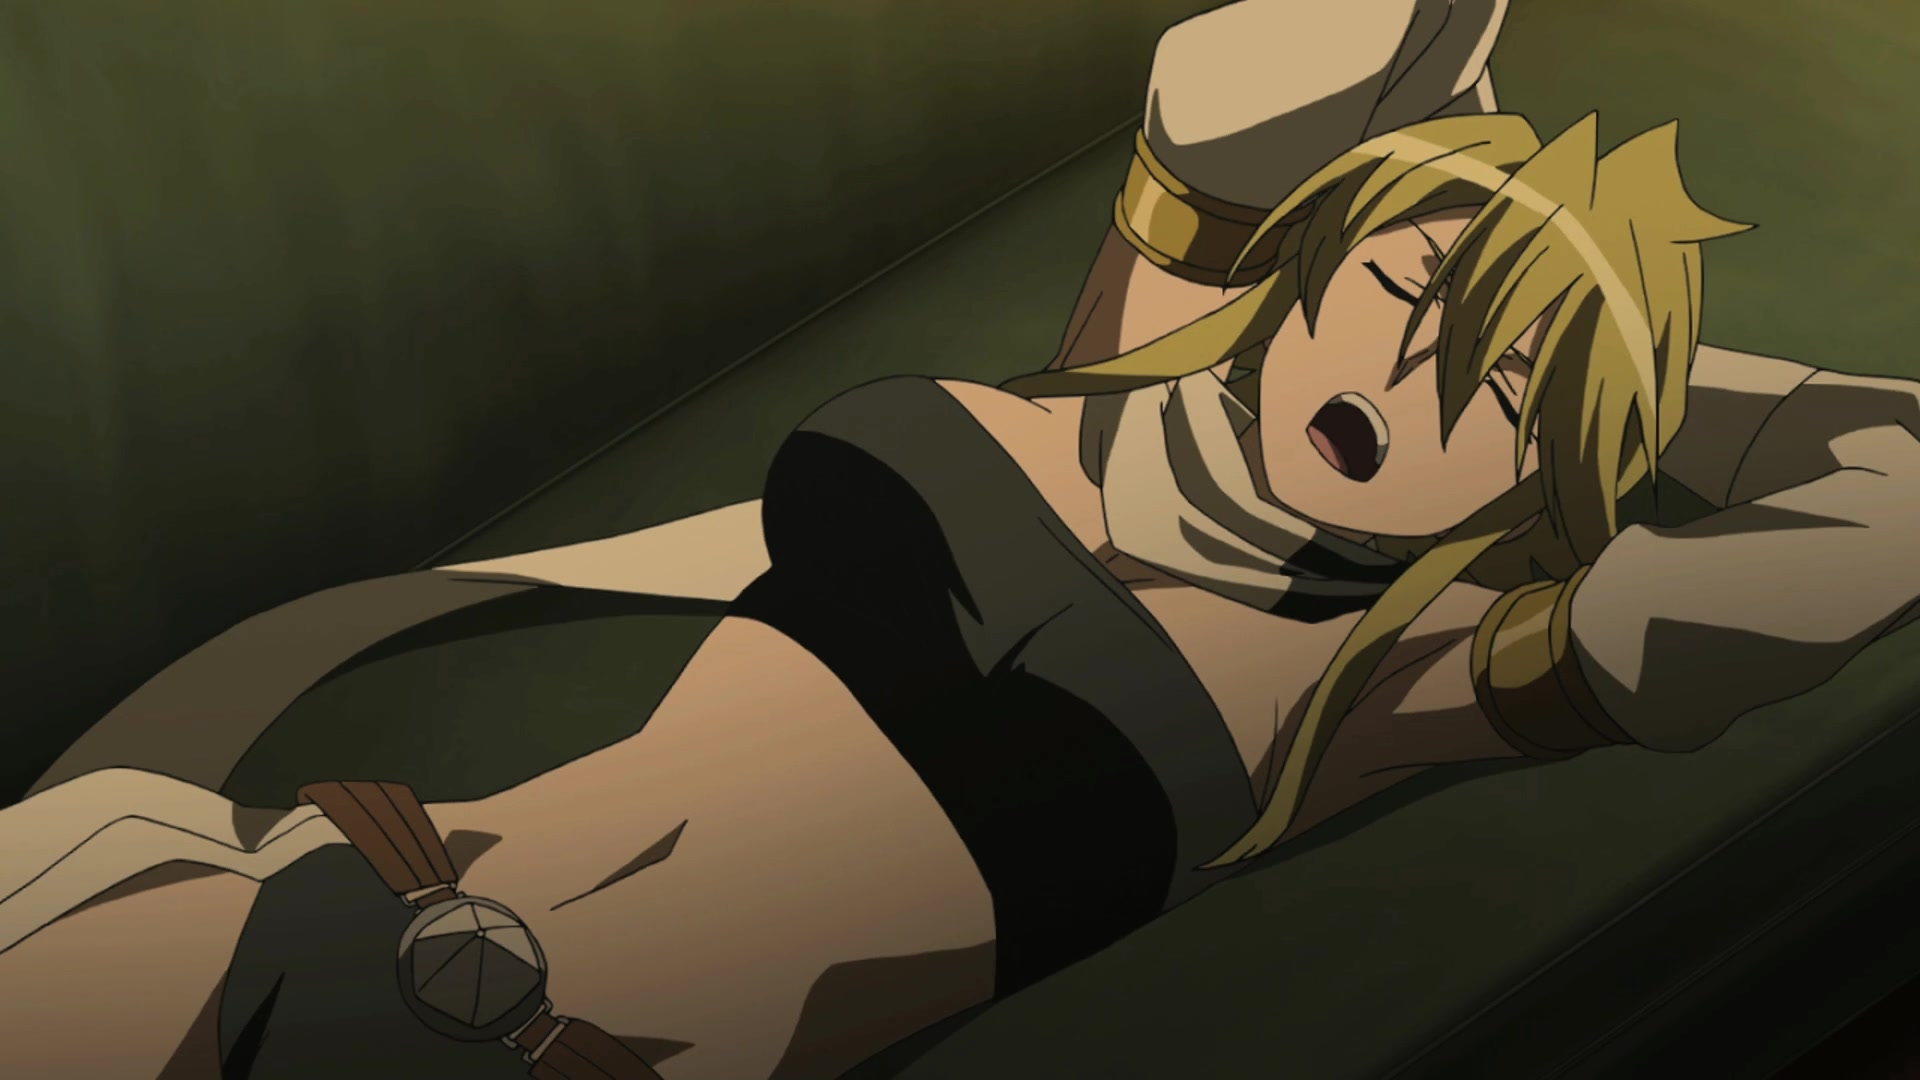 Leone -Akame ga Kill!